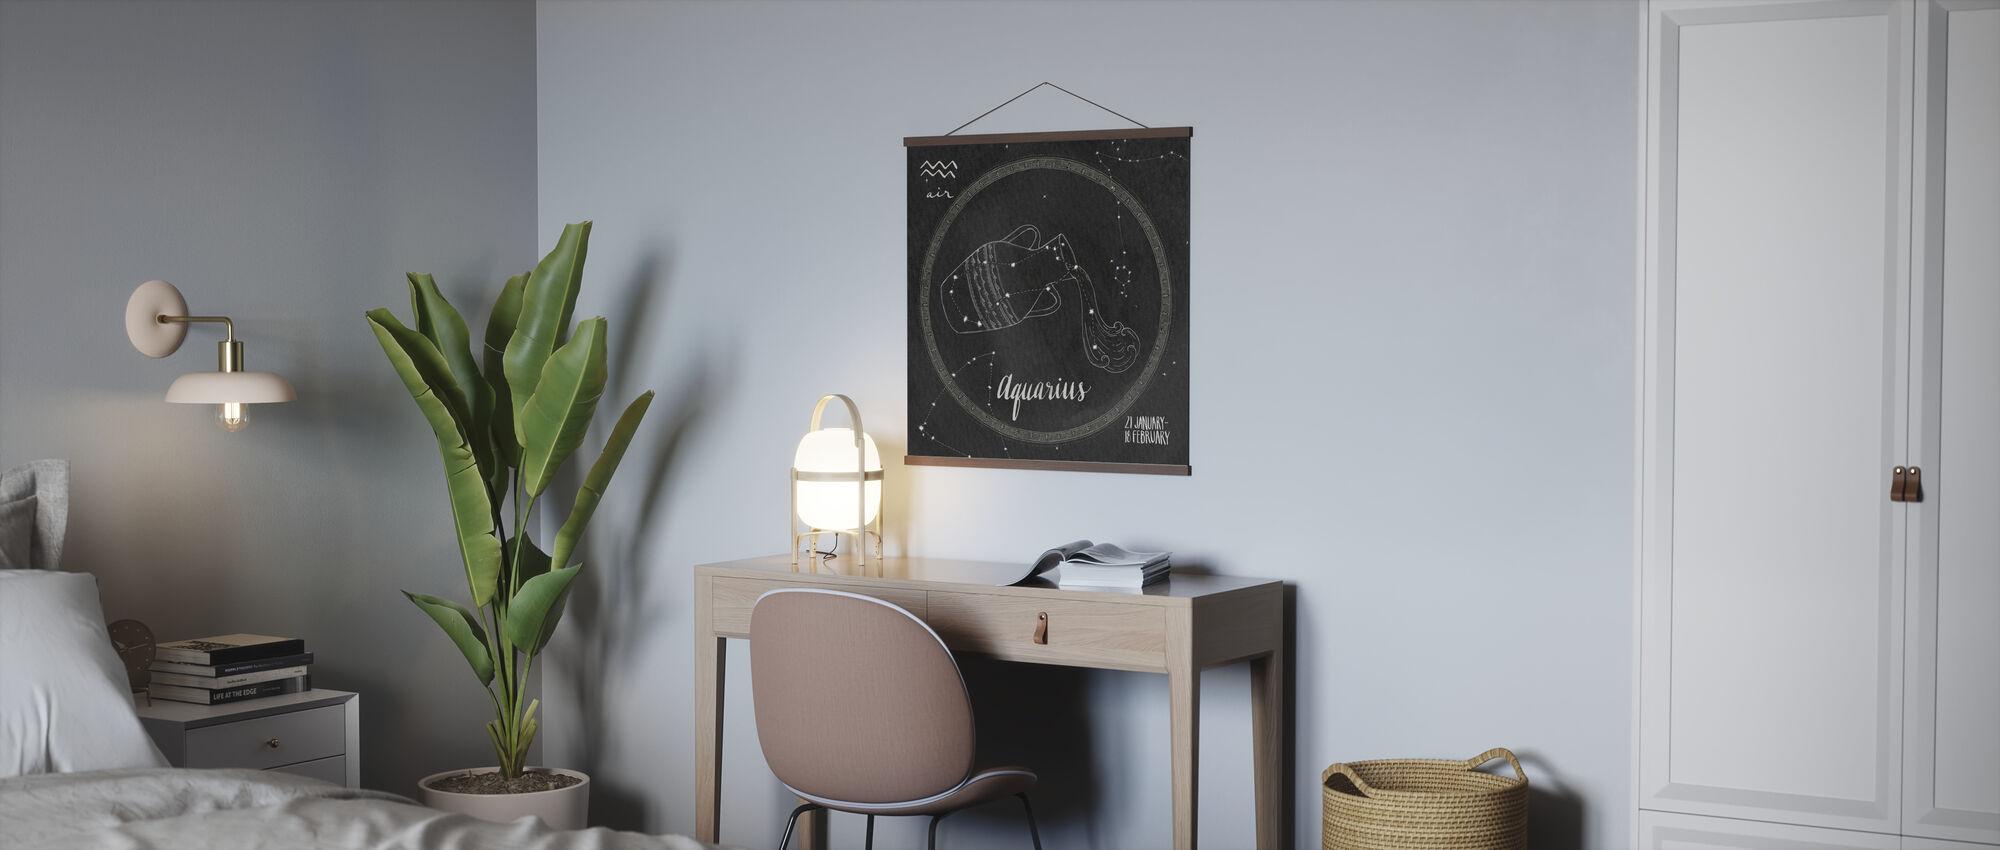 Nachthimmel Wassermann - Poster - Büro